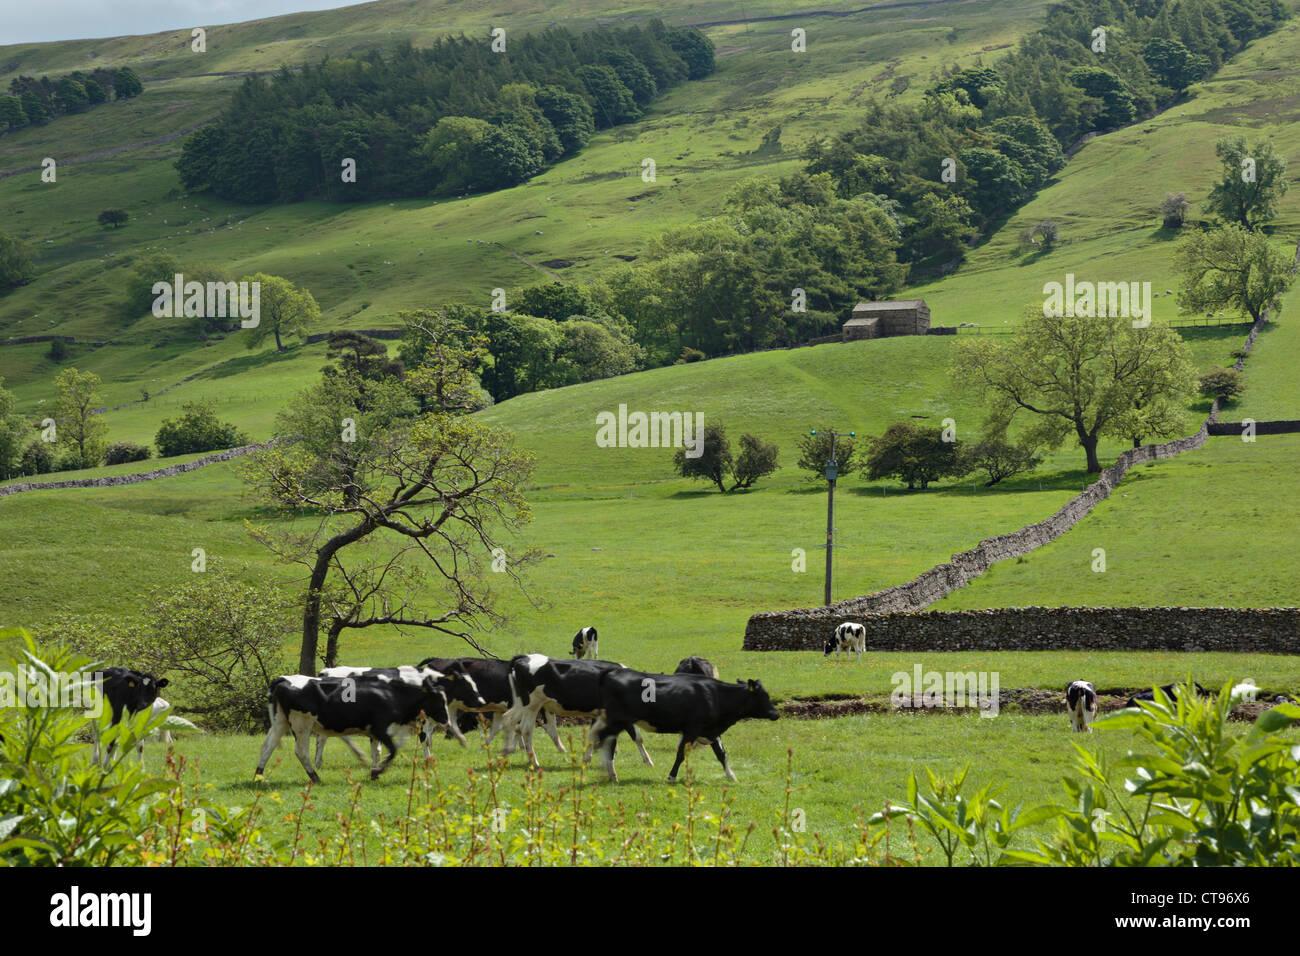 Bishopdale, Yorkshire Dales National Park. - Stock Image